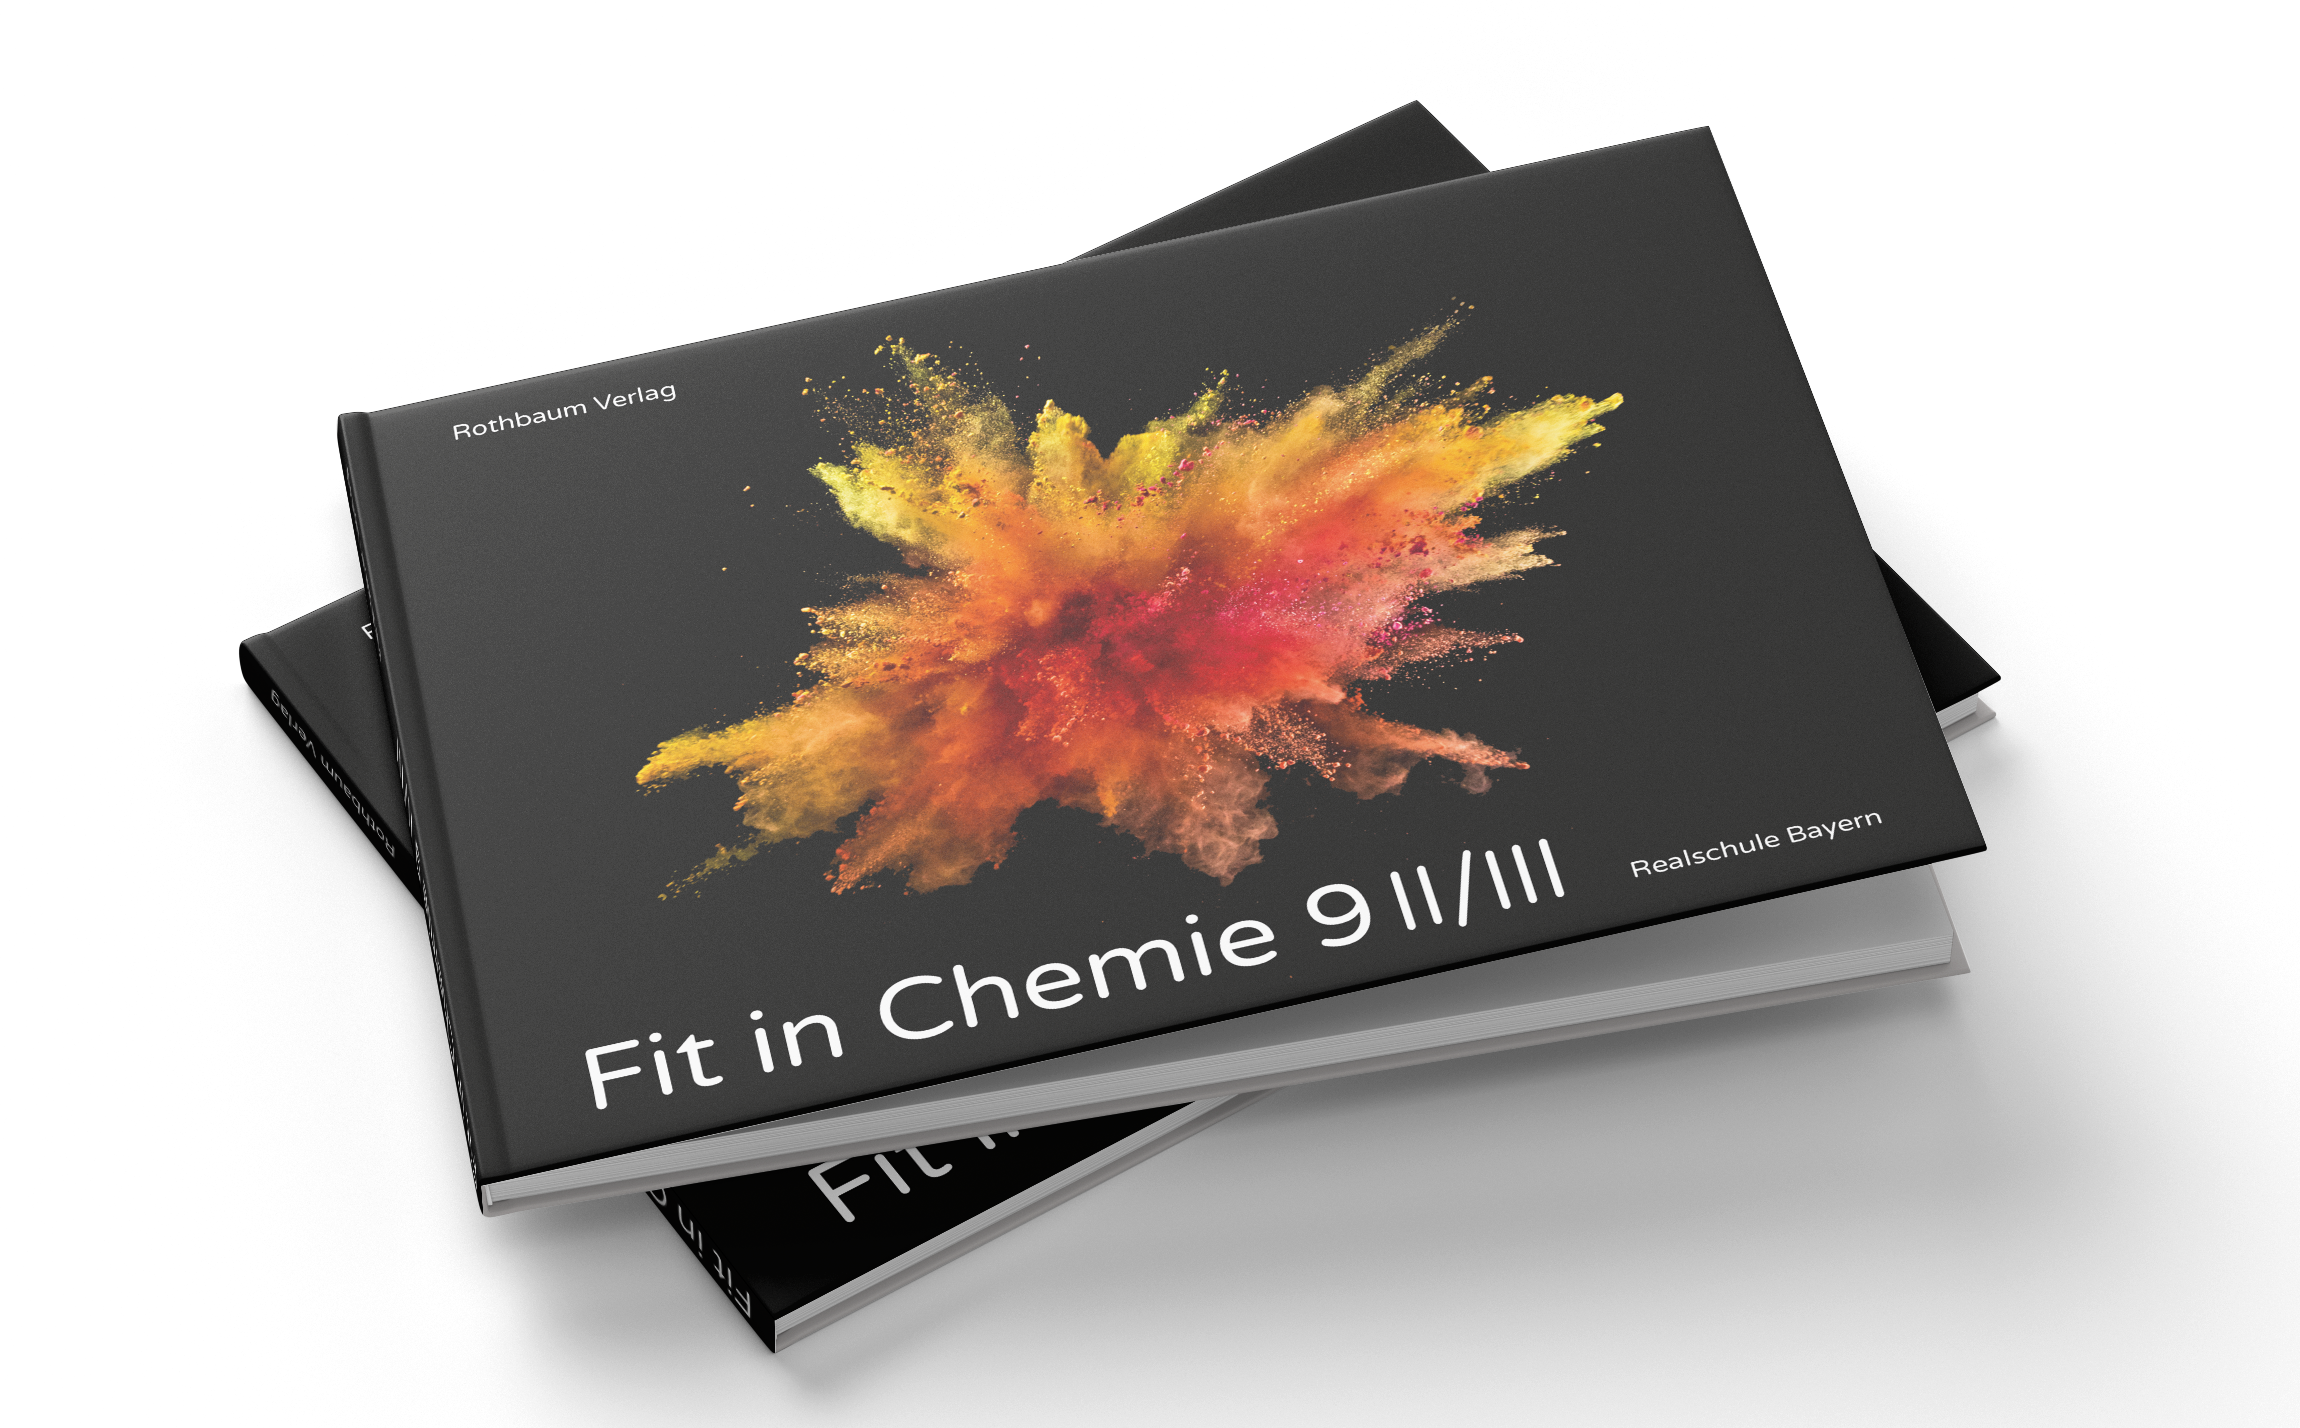 Fit in Chemie 9 II/III [gedrucktes Schulbuch]